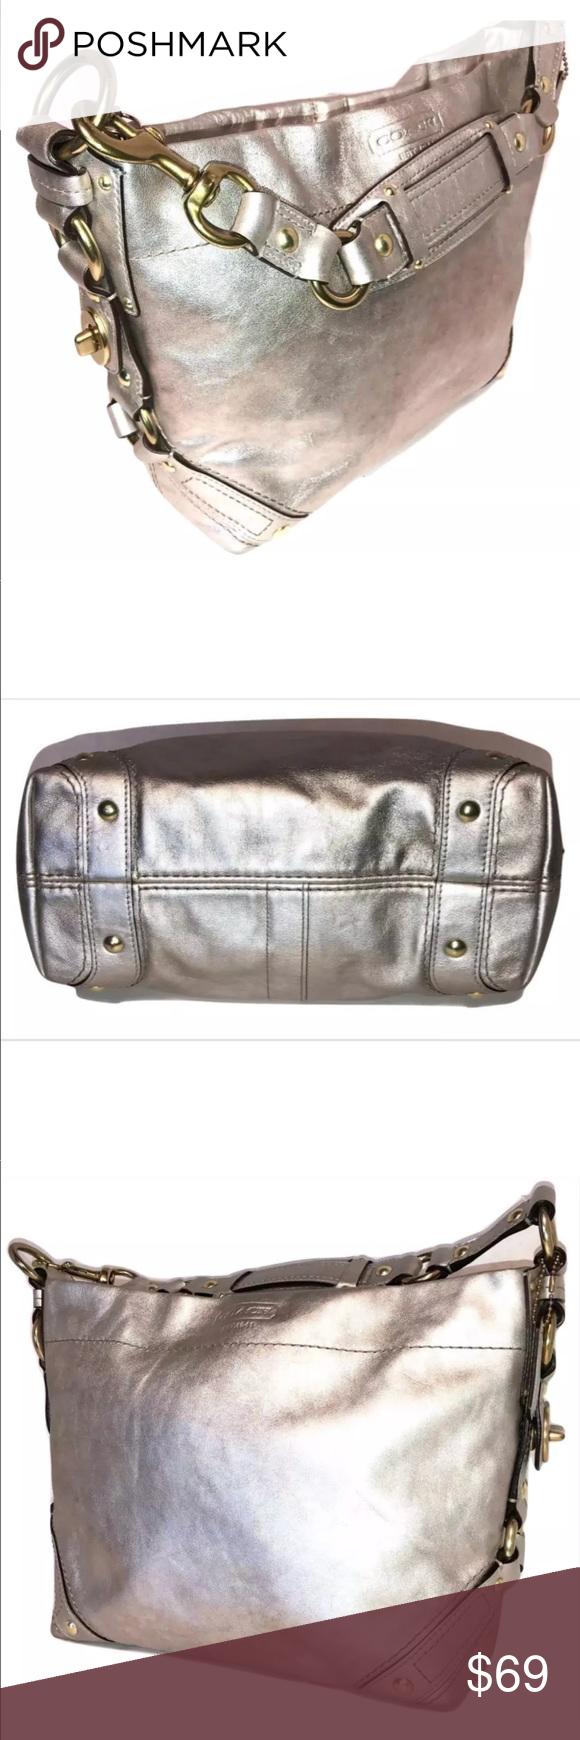 Coach Carly Metallic Leather Hobo Shoulder Bag   Metallic leather ... b8aba0582f